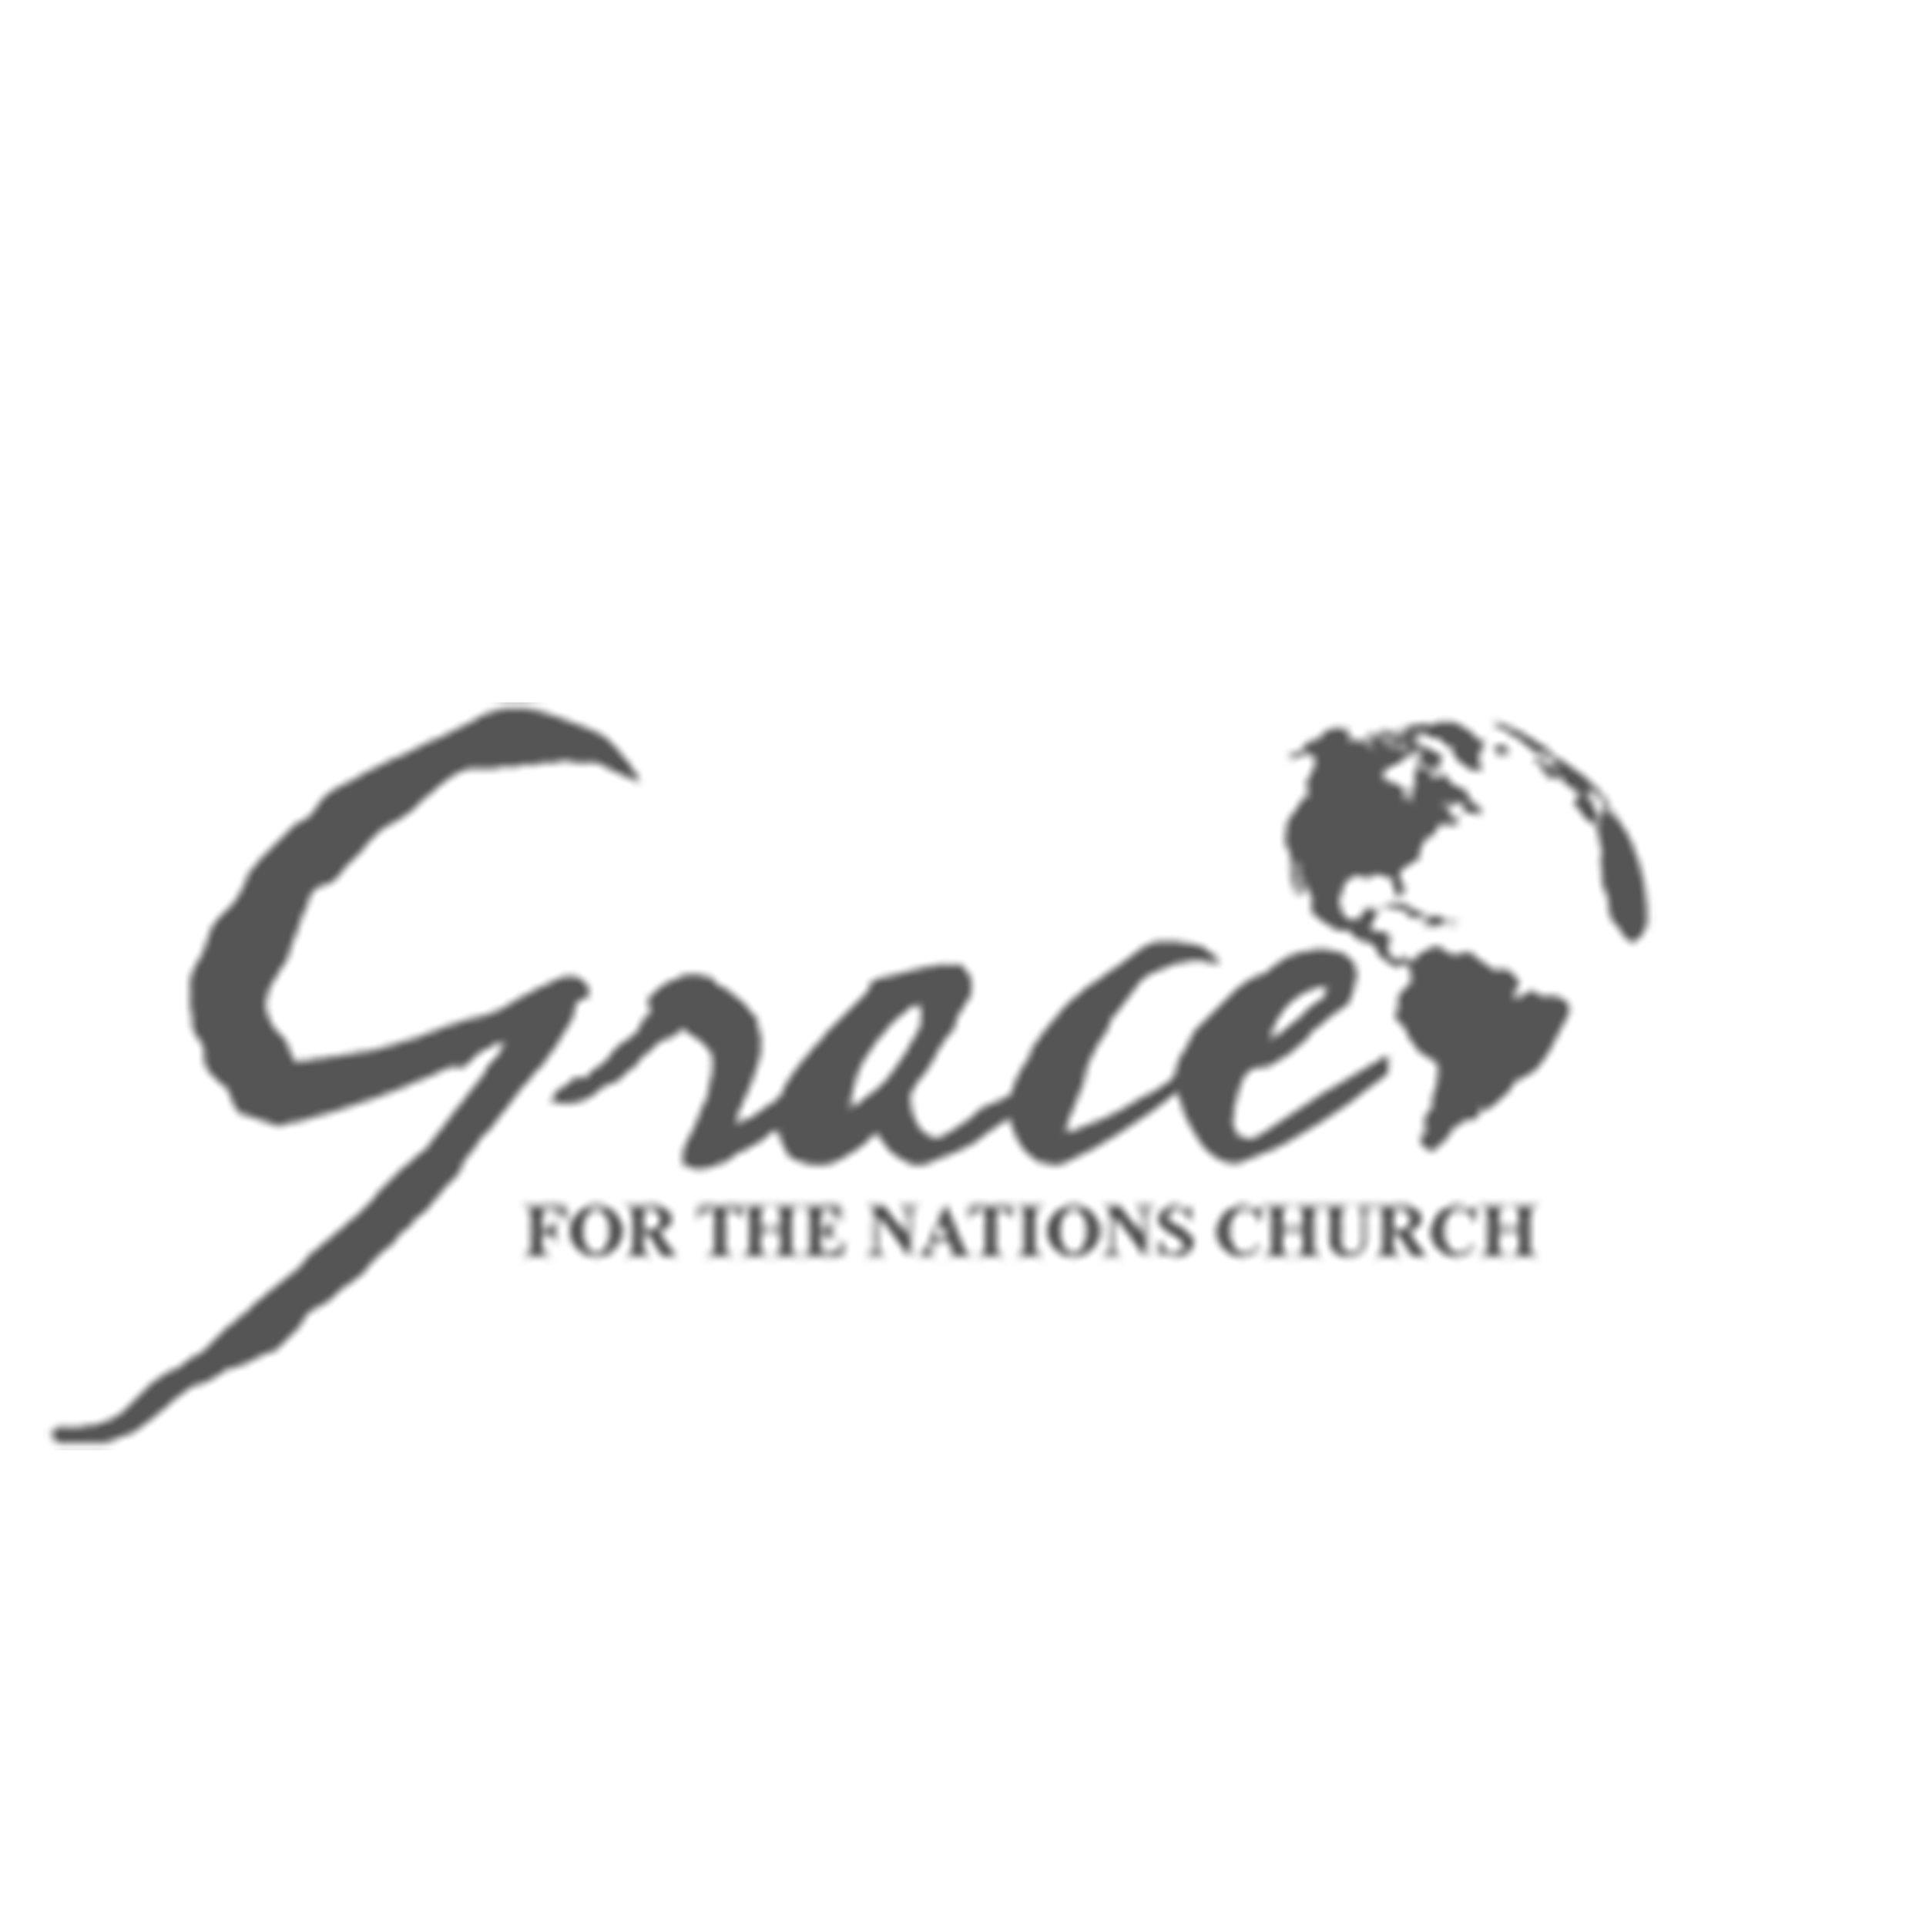 GFTNC_gray.jpg